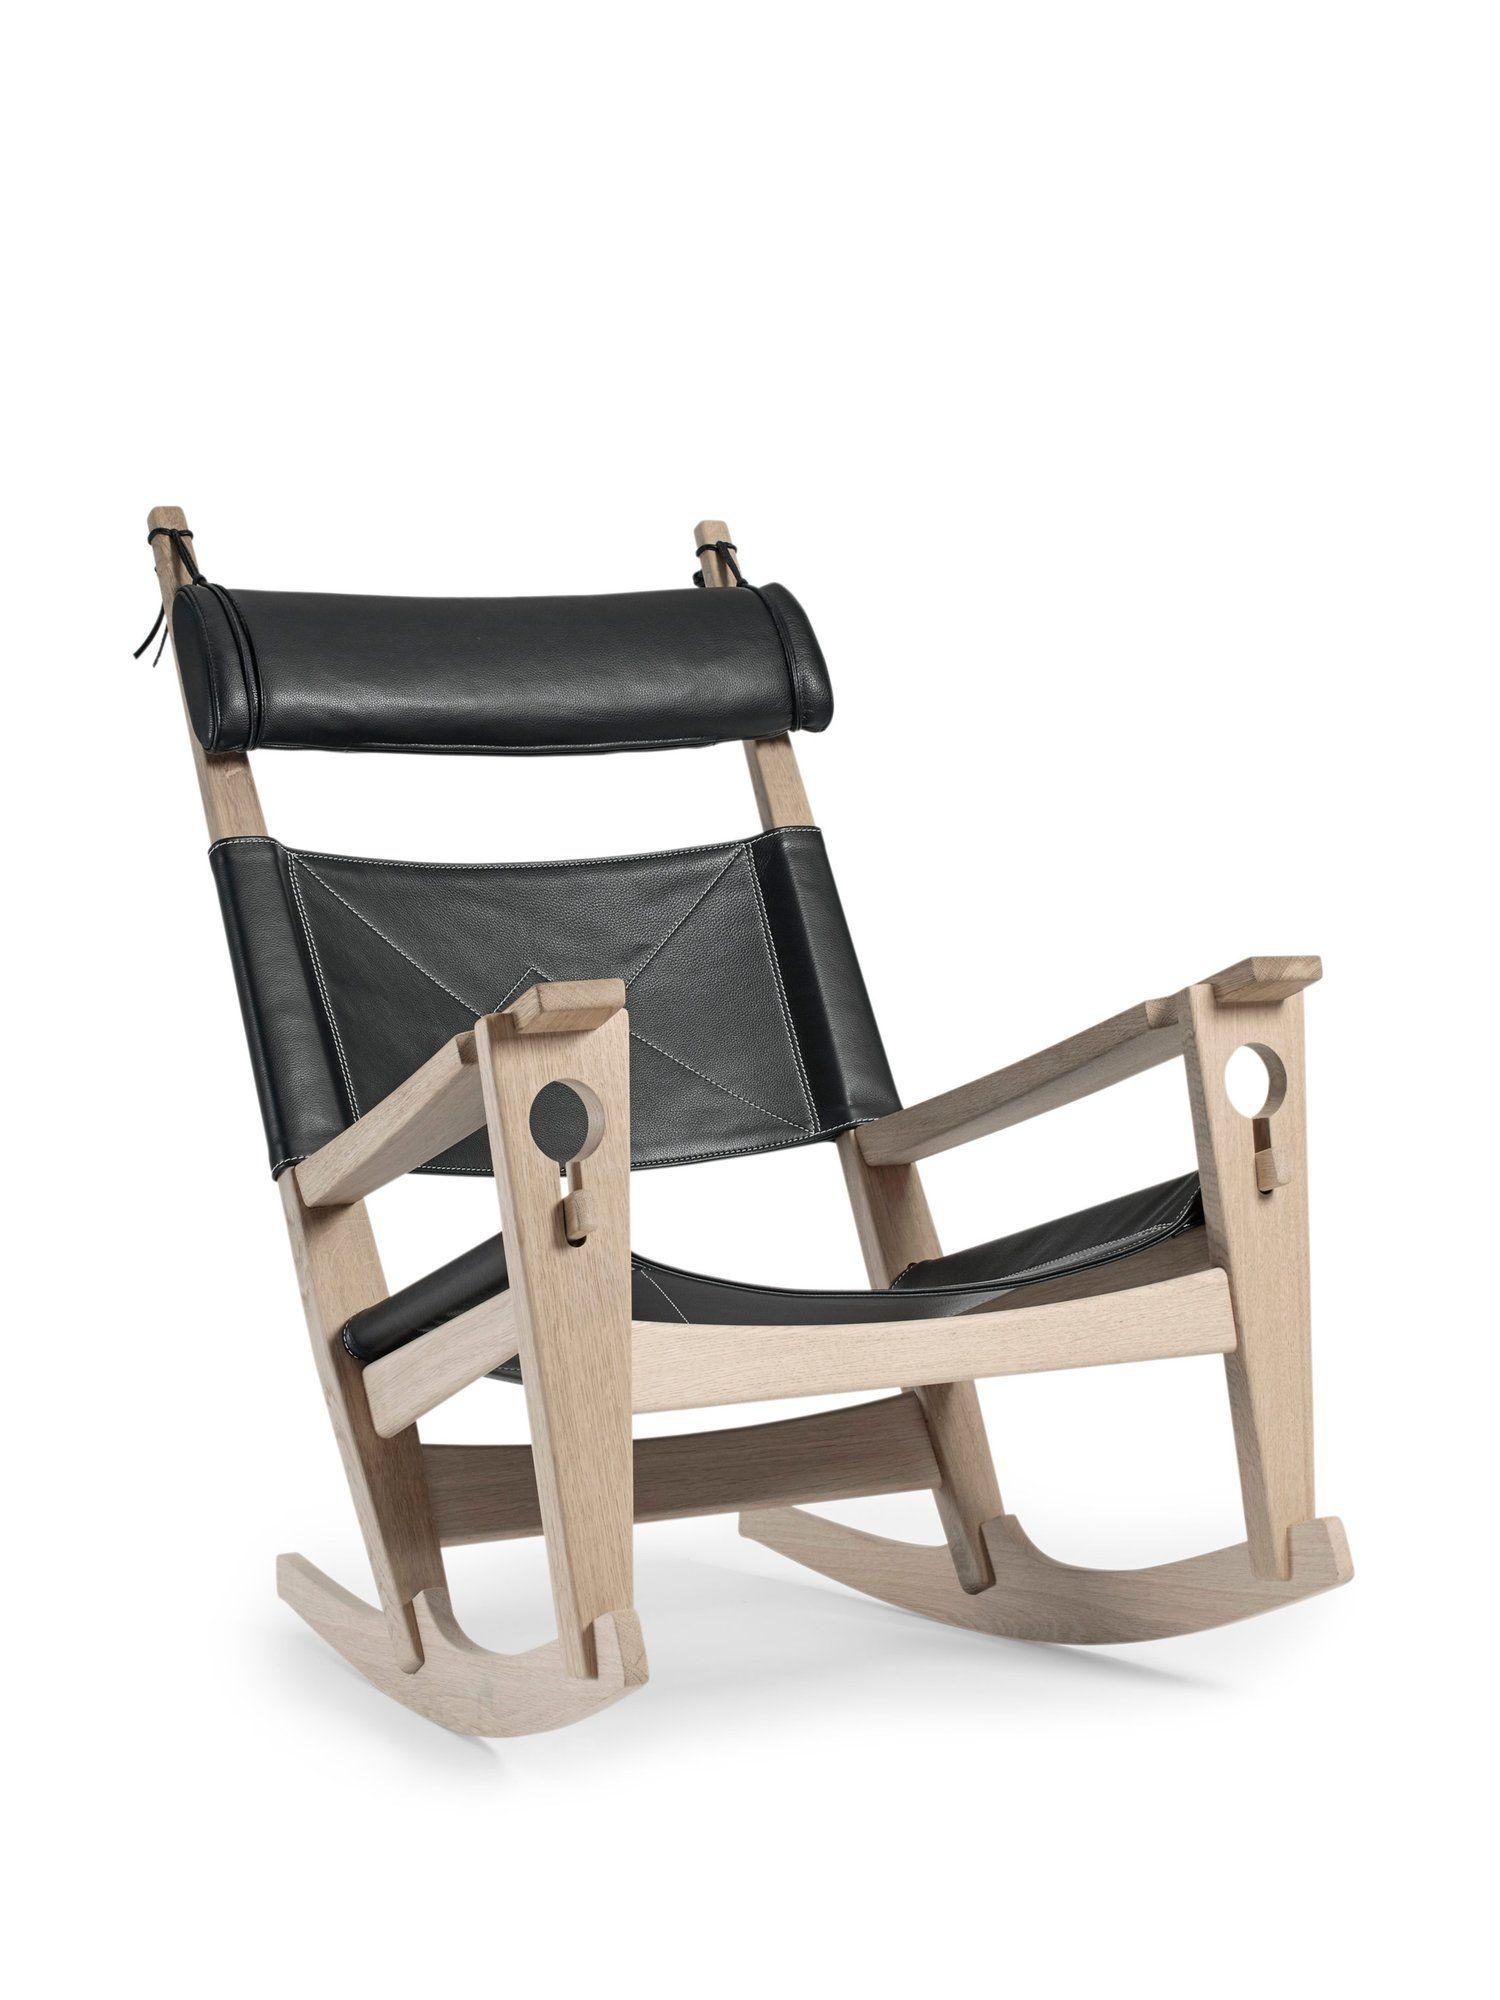 The Ge673 Rocking Chair Rocking Chair Rocking Chair Plans